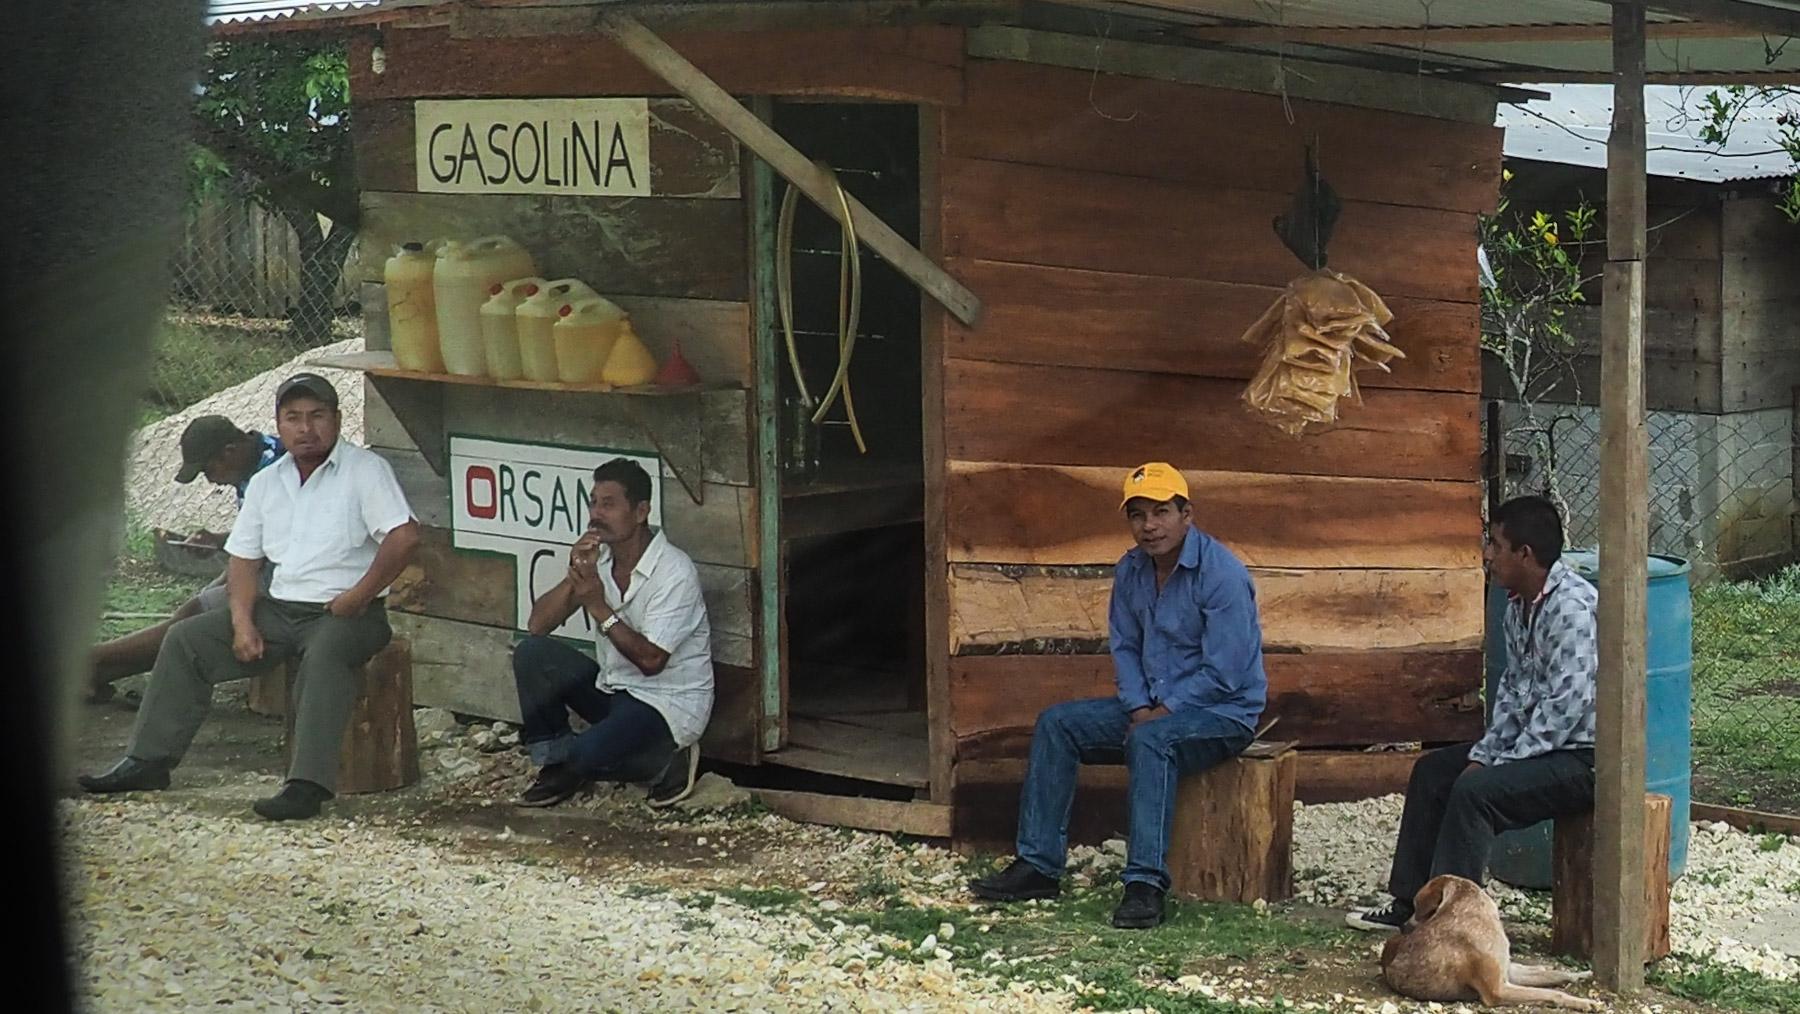 Tankstelle mit Schmuggelbenzin aus Guatemala in Chiapas